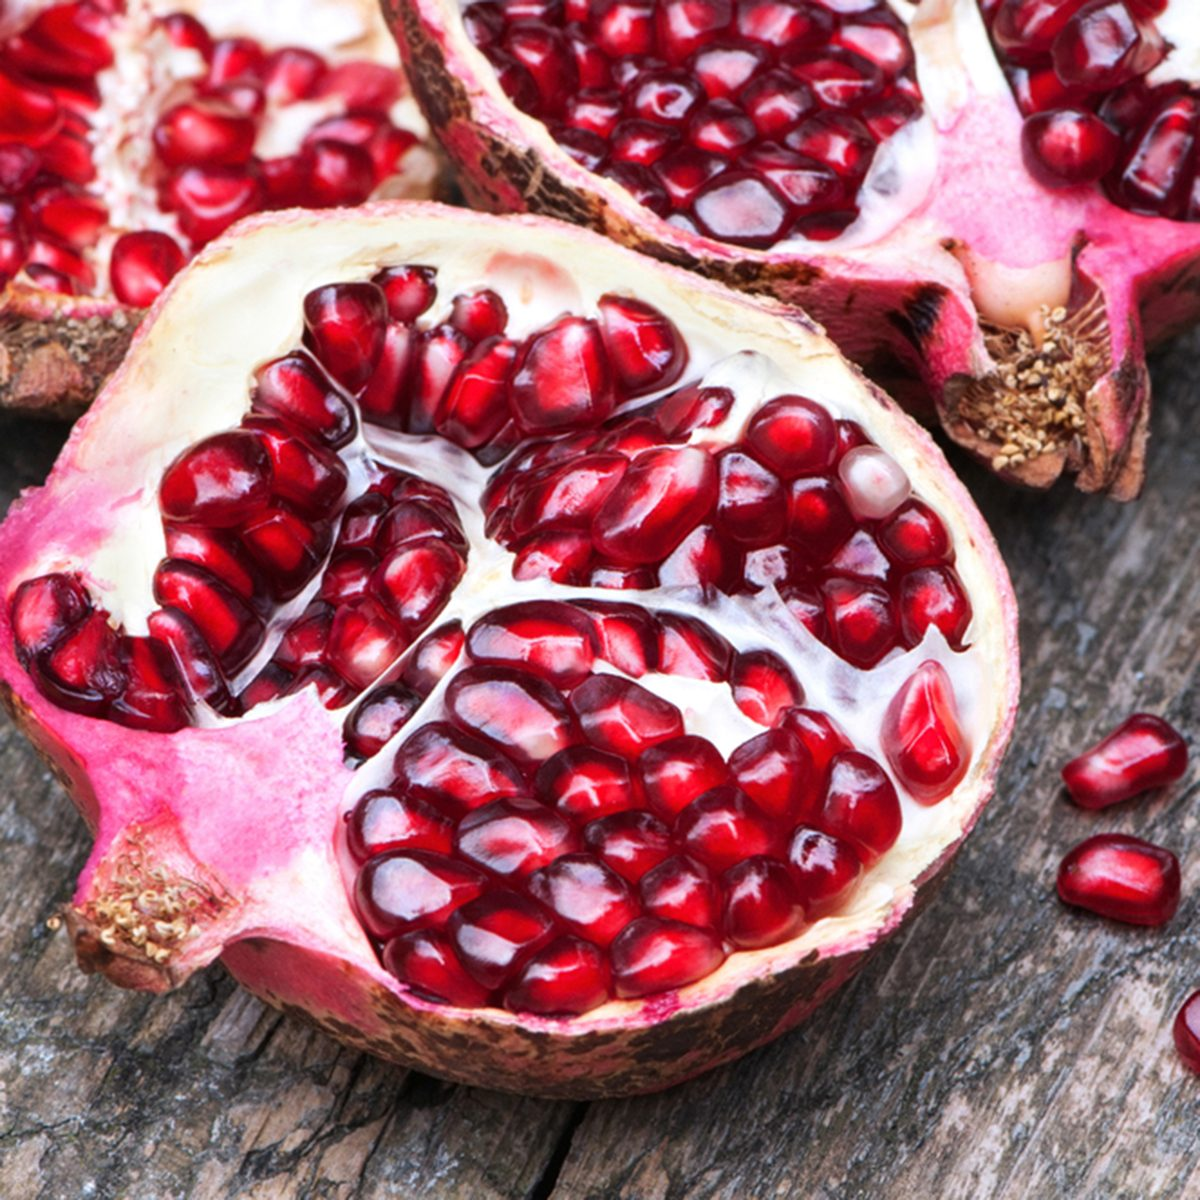 Juicy pomegranates on wood